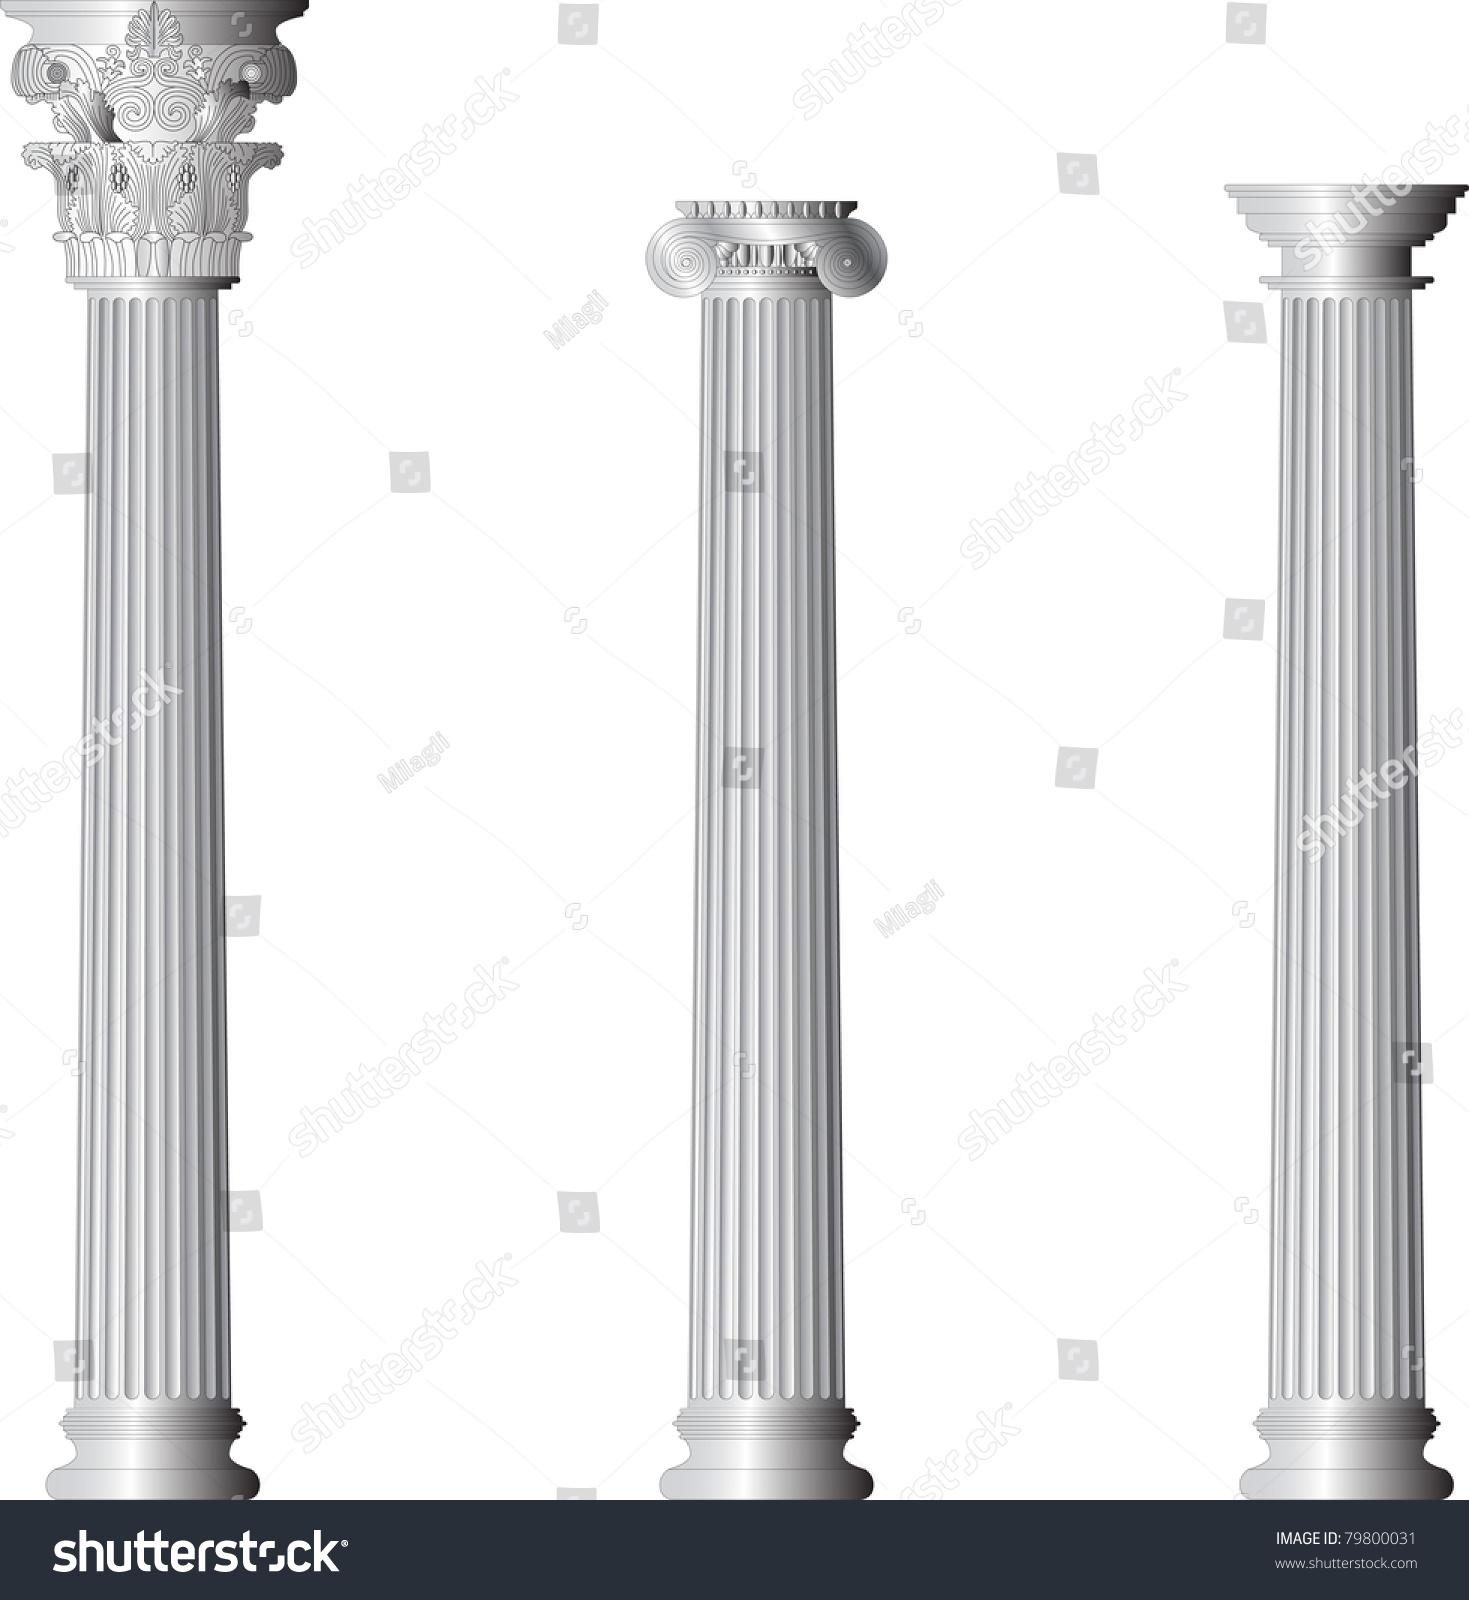 Corinthian ionic doric columns stock vector 79800031 for Doric columns